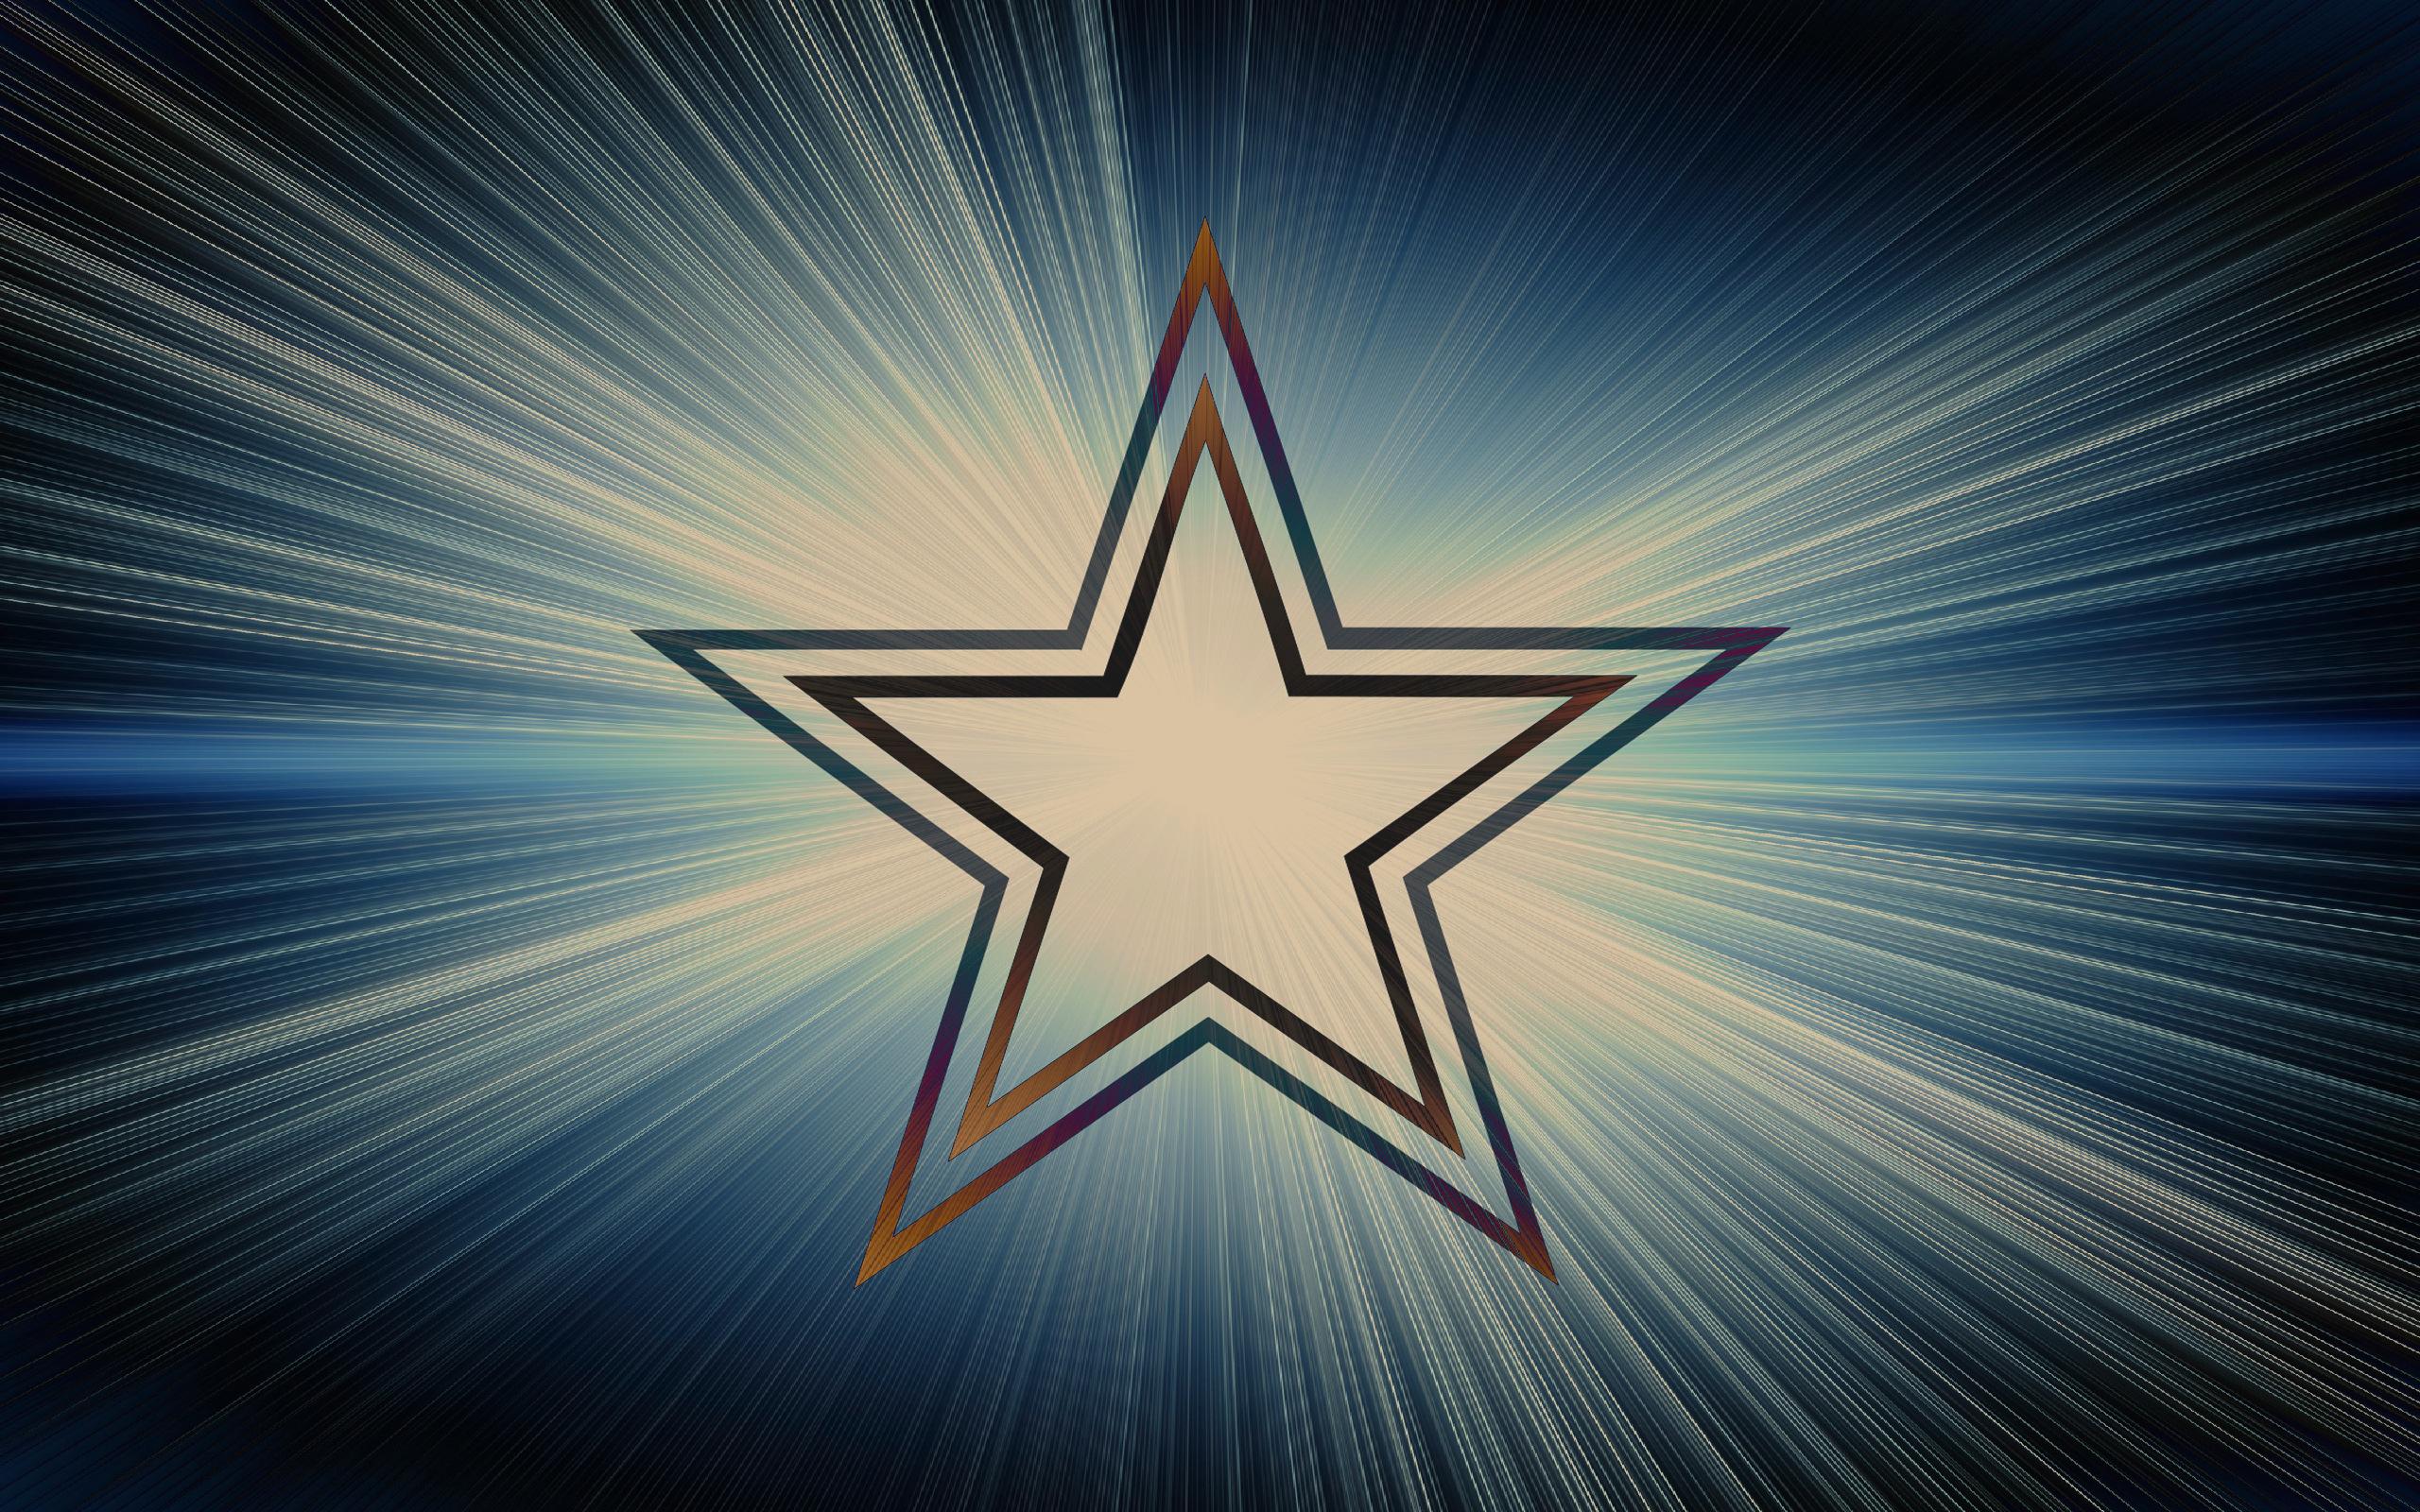 Dallas Cowboys Wallpapers Download 2560x1600